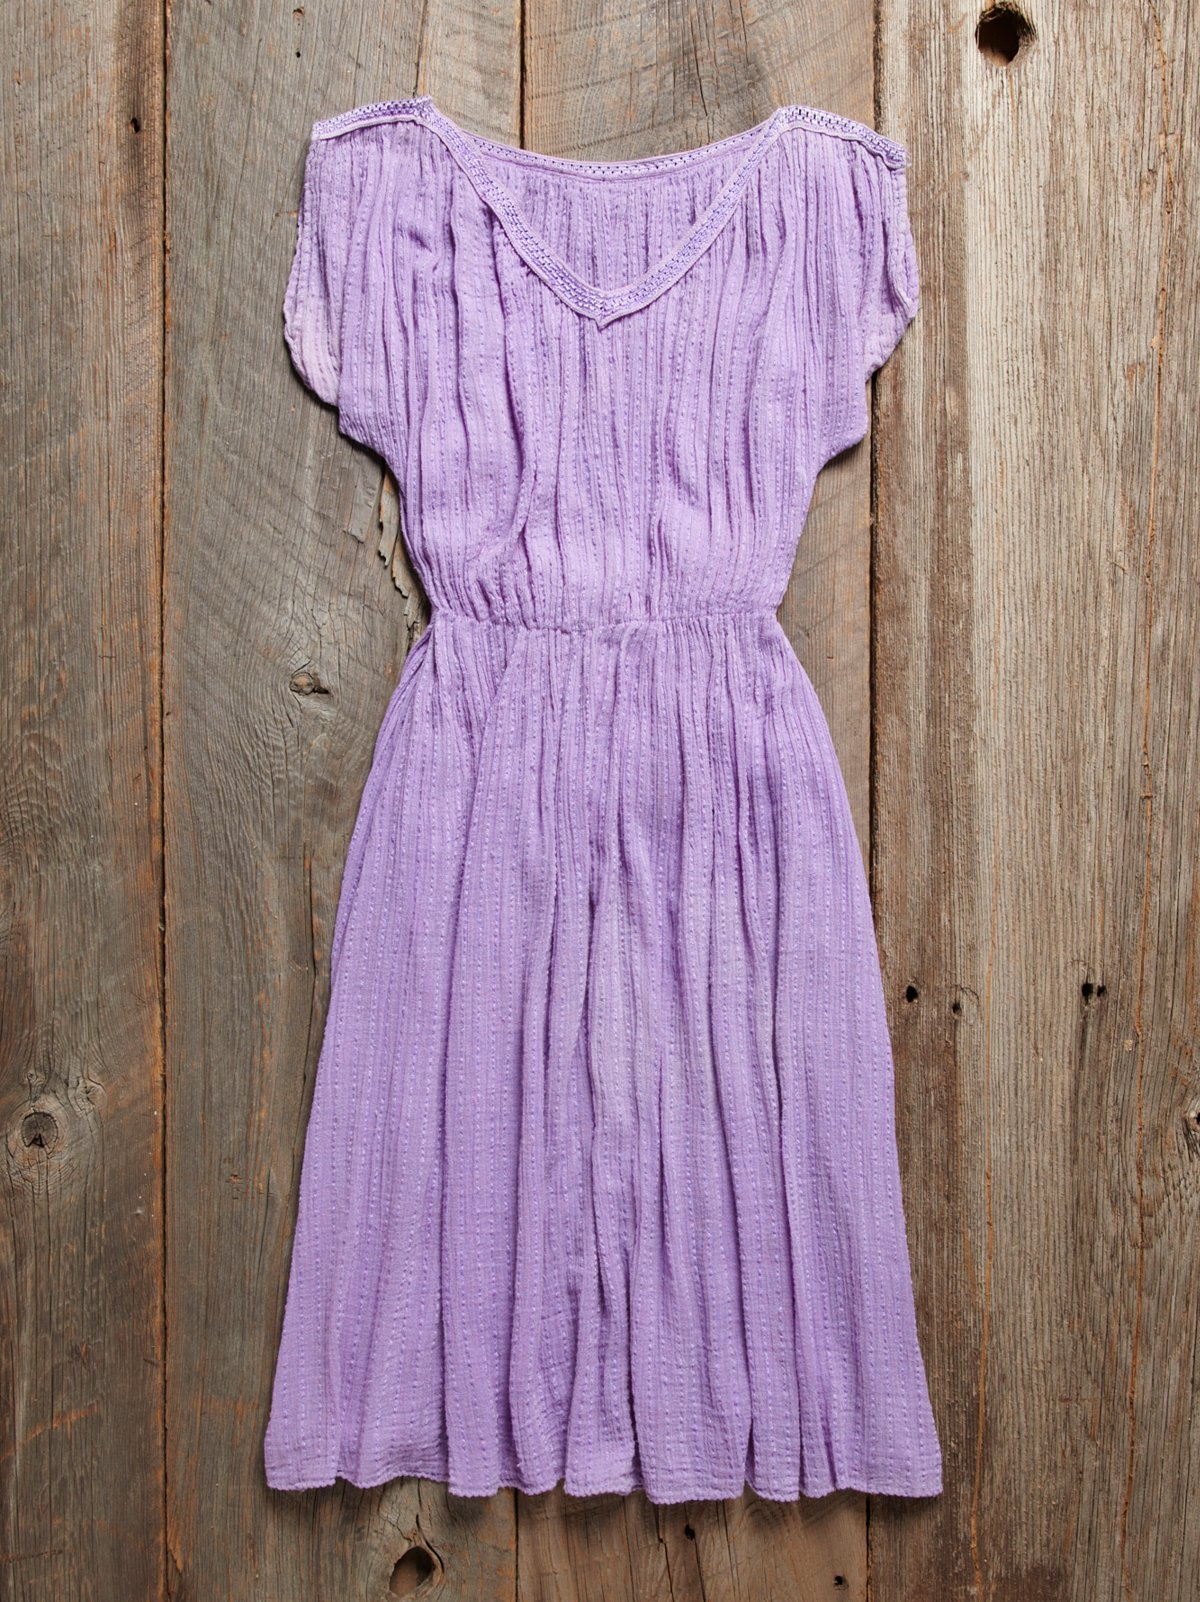 Vintage 1960s Gauze Dress